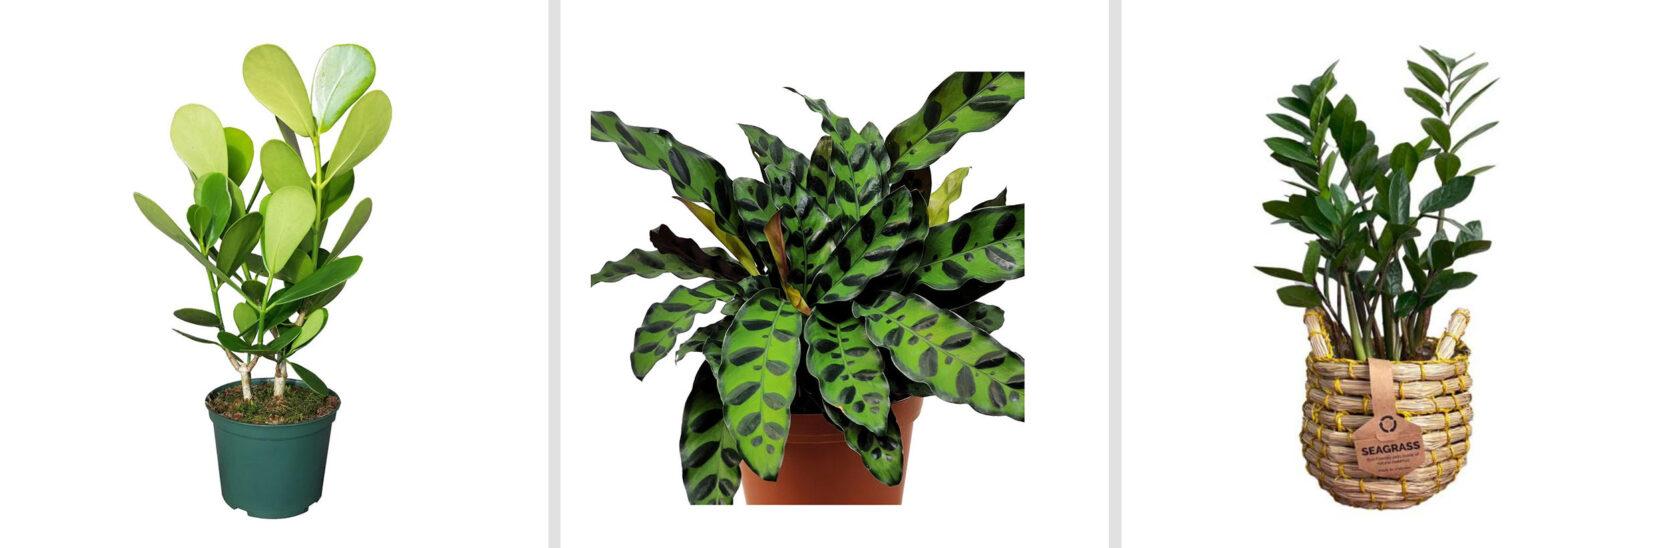 Emily Henderson Online Plant Guide Home Depot